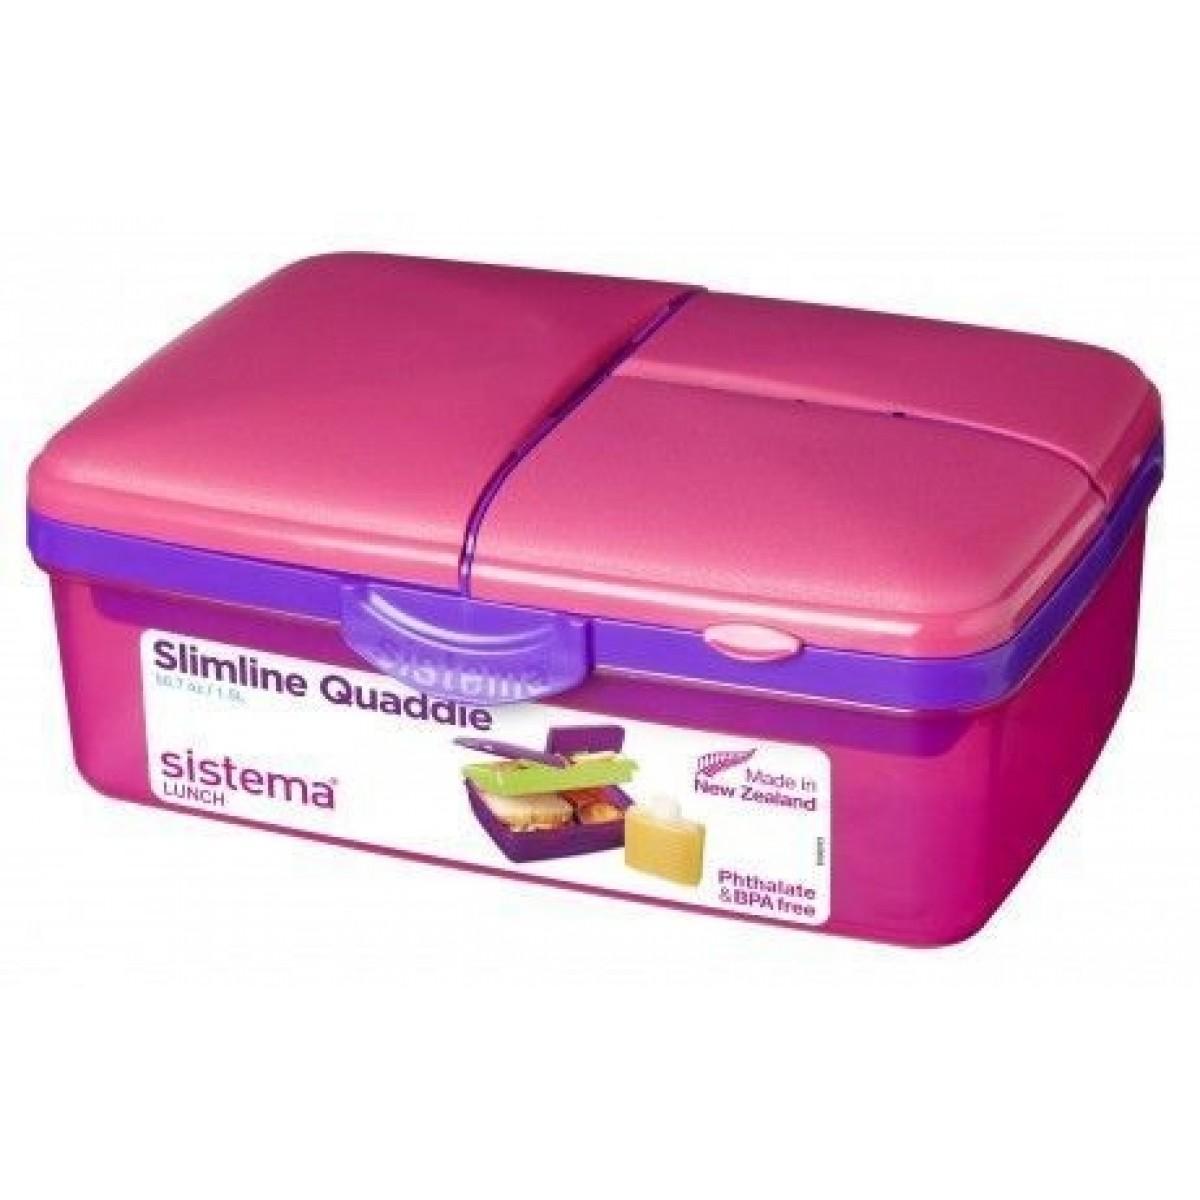 SISTEMA Quaddie slimline madkasse lyserød 1,5 ltr.